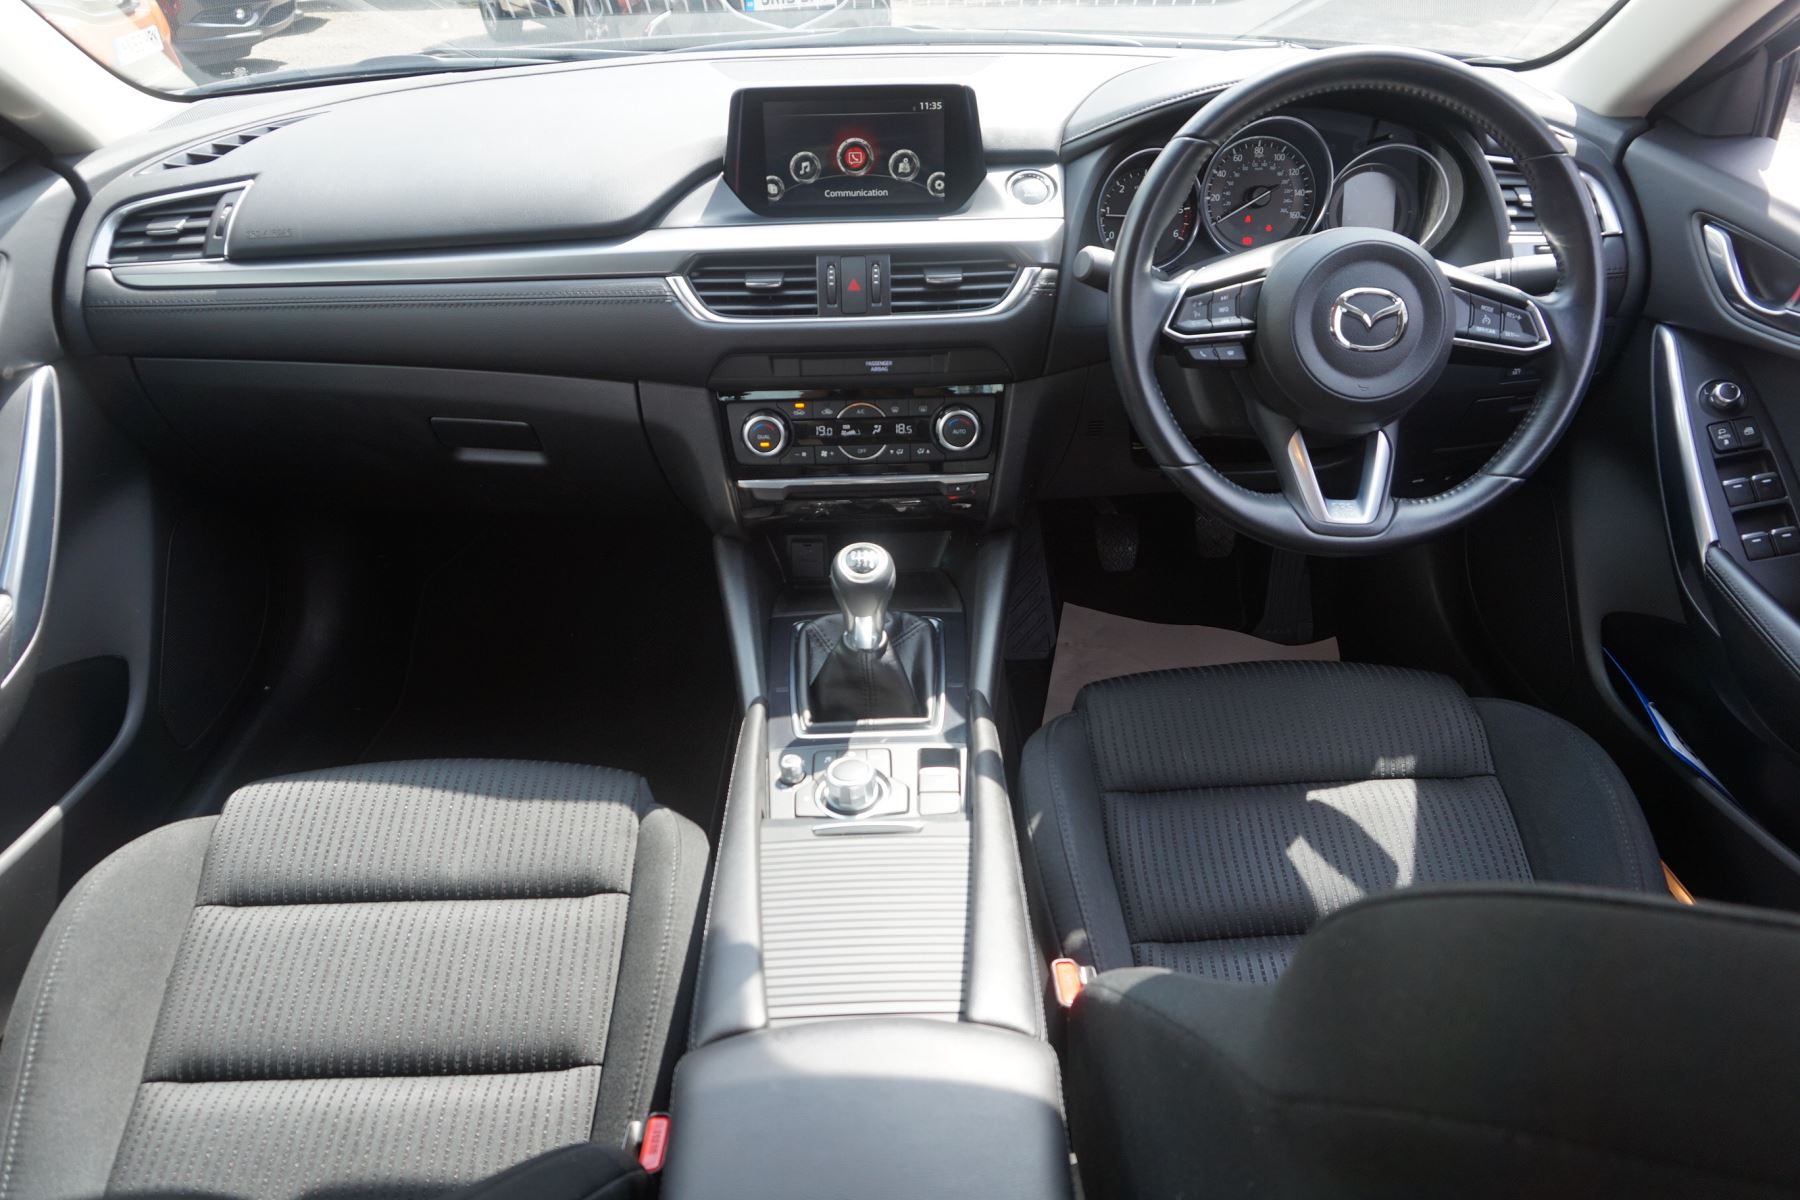 Mazda 6 2.2d SE-L Nav 4dr image 11